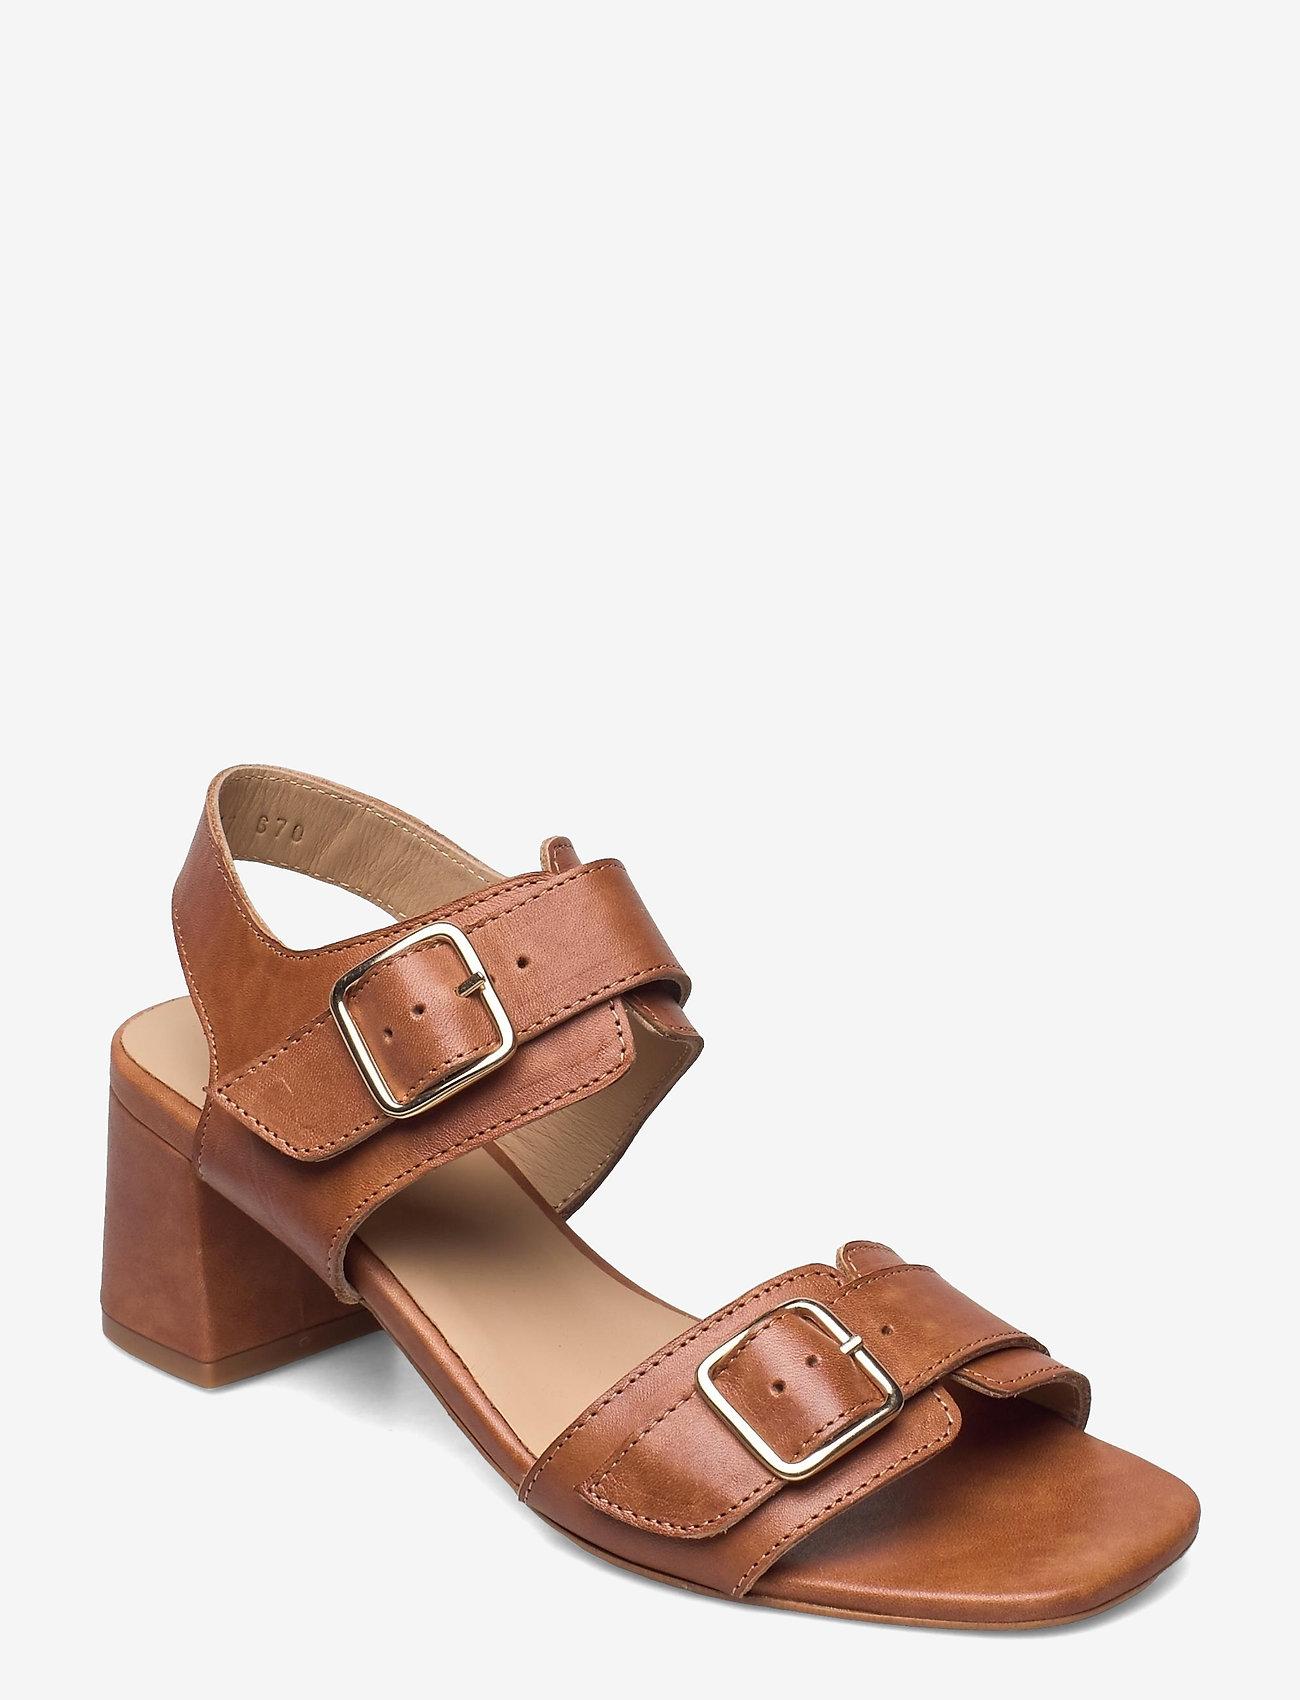 ANGULUS - Sandals - Block heels - sandalen mit absatz - 1789 tan - 0